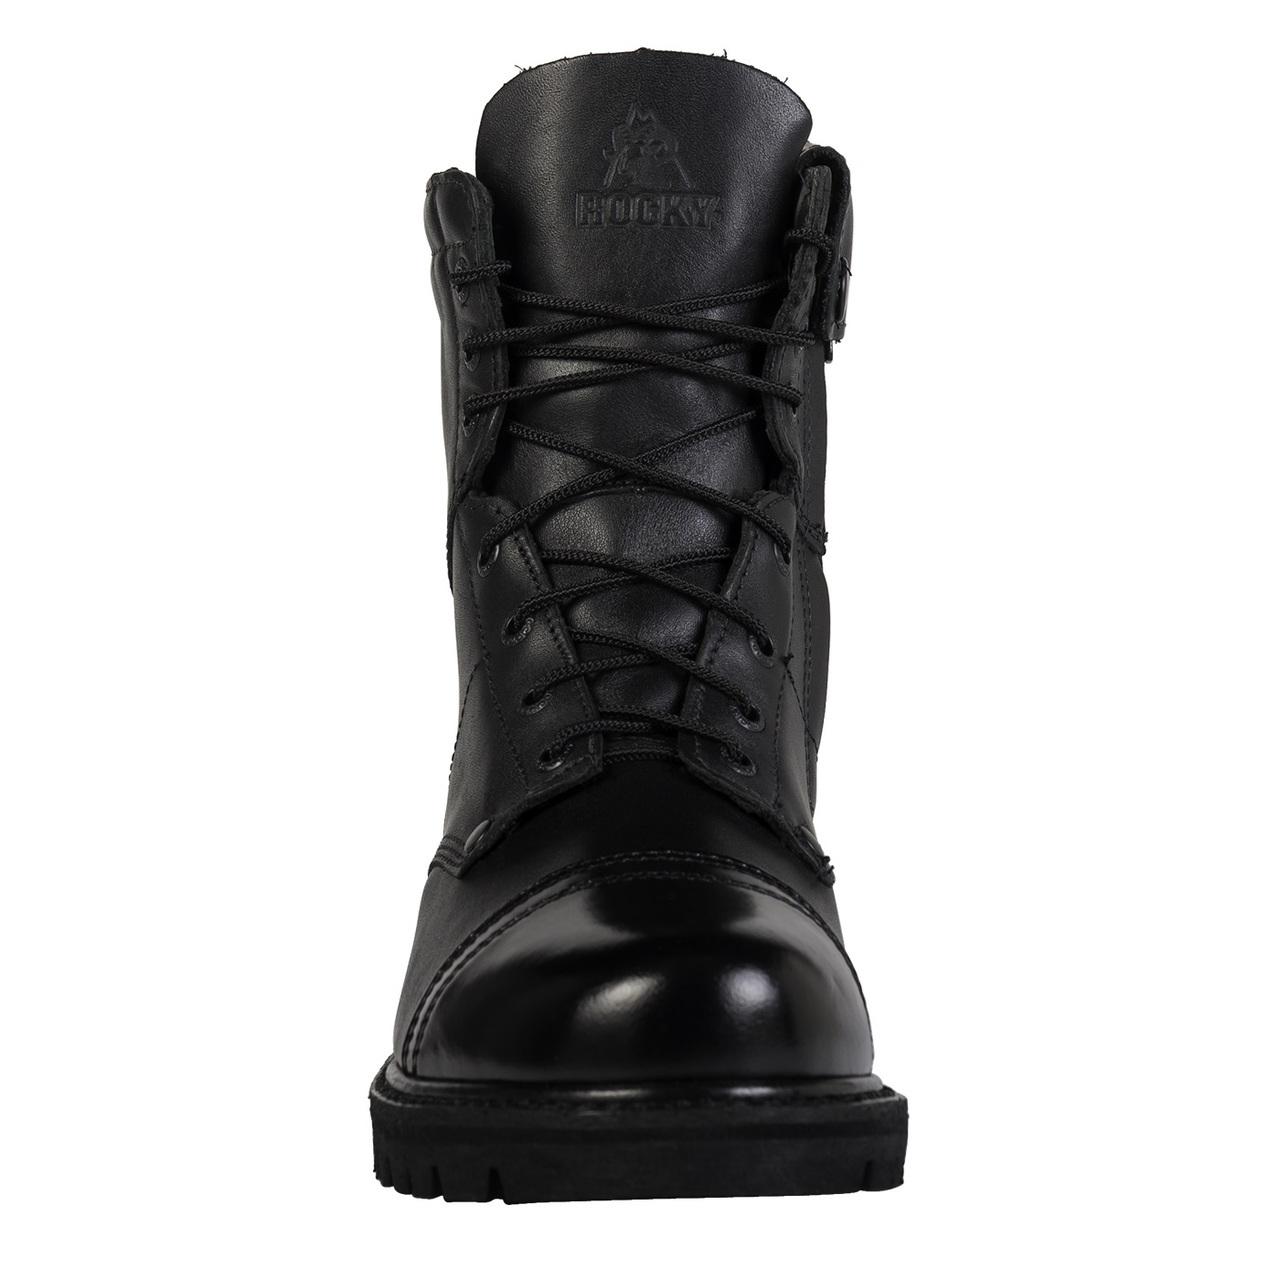 "Rocky 7"" Size-Zip Jump Boots"